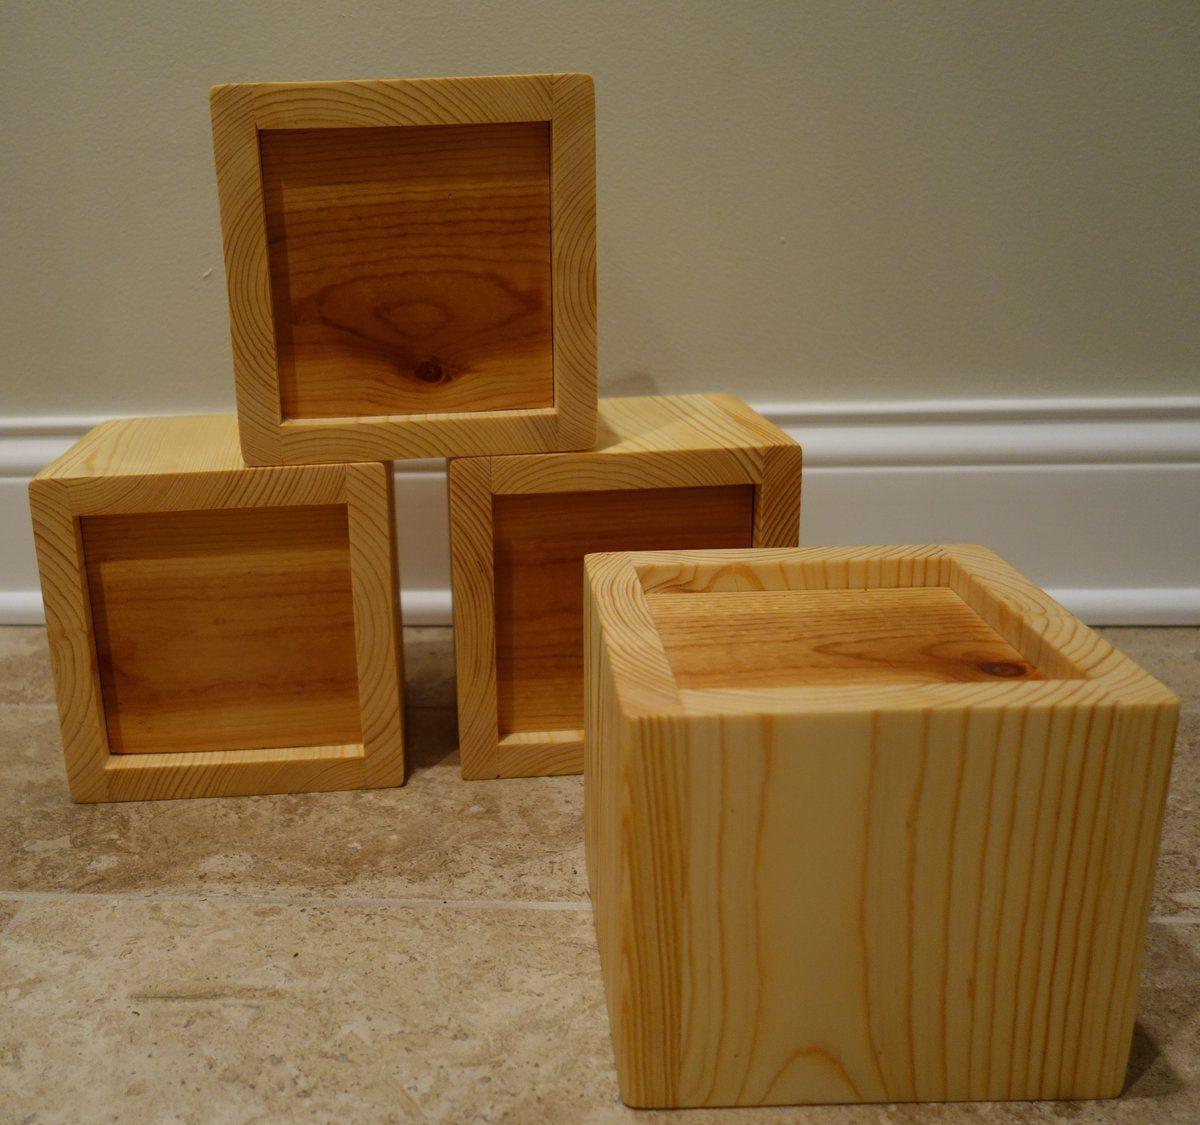 Custom Wood Bed Risers And Furniture Risers Furniture Risers Wood Bed Risers Wood Beds